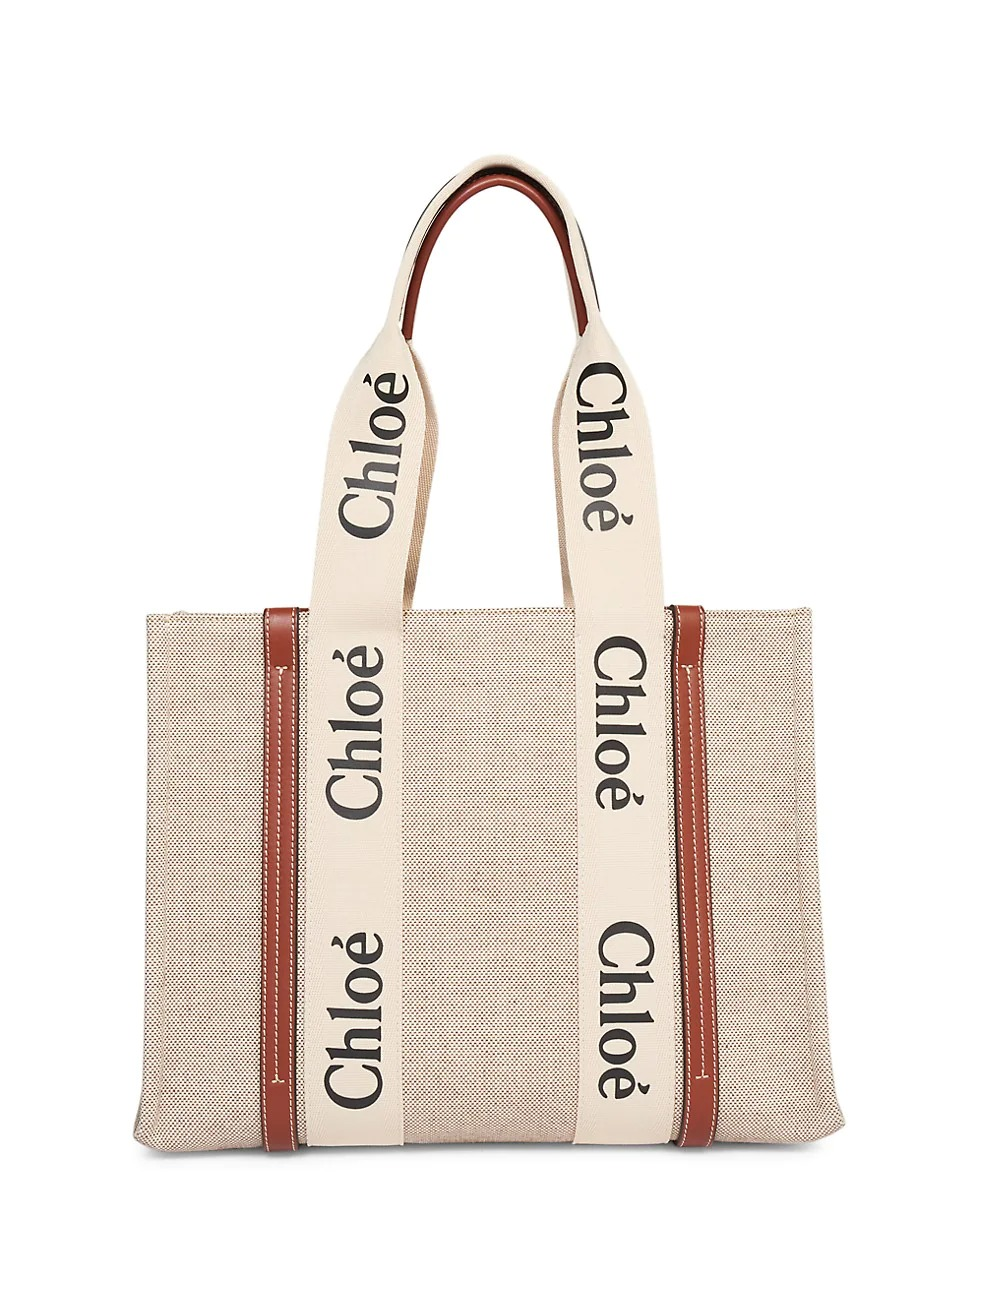 Chloe Medium Woody Canvas Tote in beige for best designer bags for travel